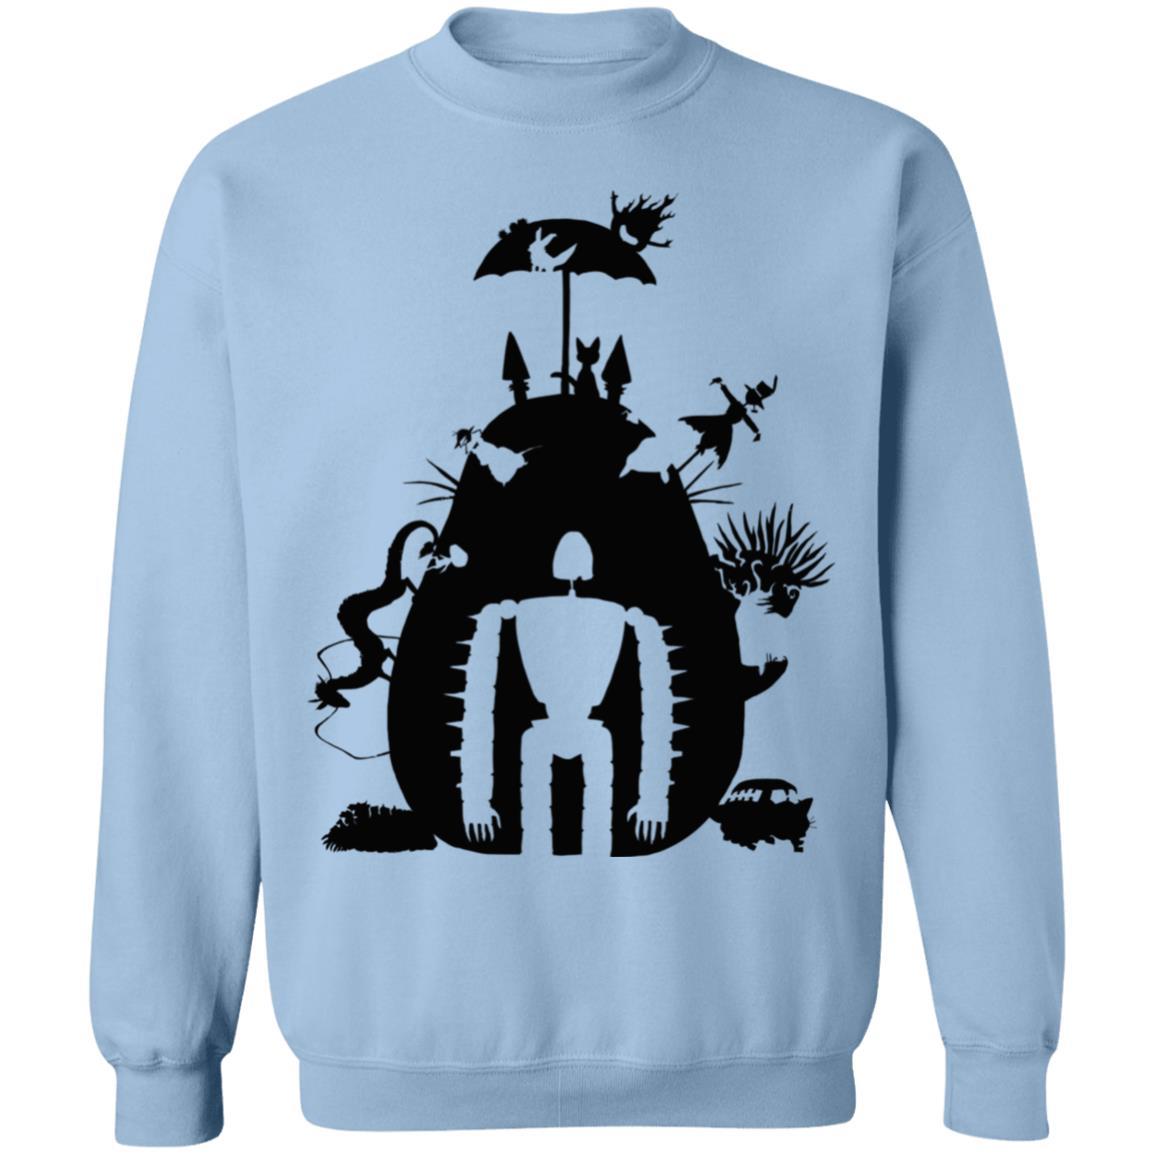 Studio Ghibli Black & White Art Compilation Sweatshirt Unisex